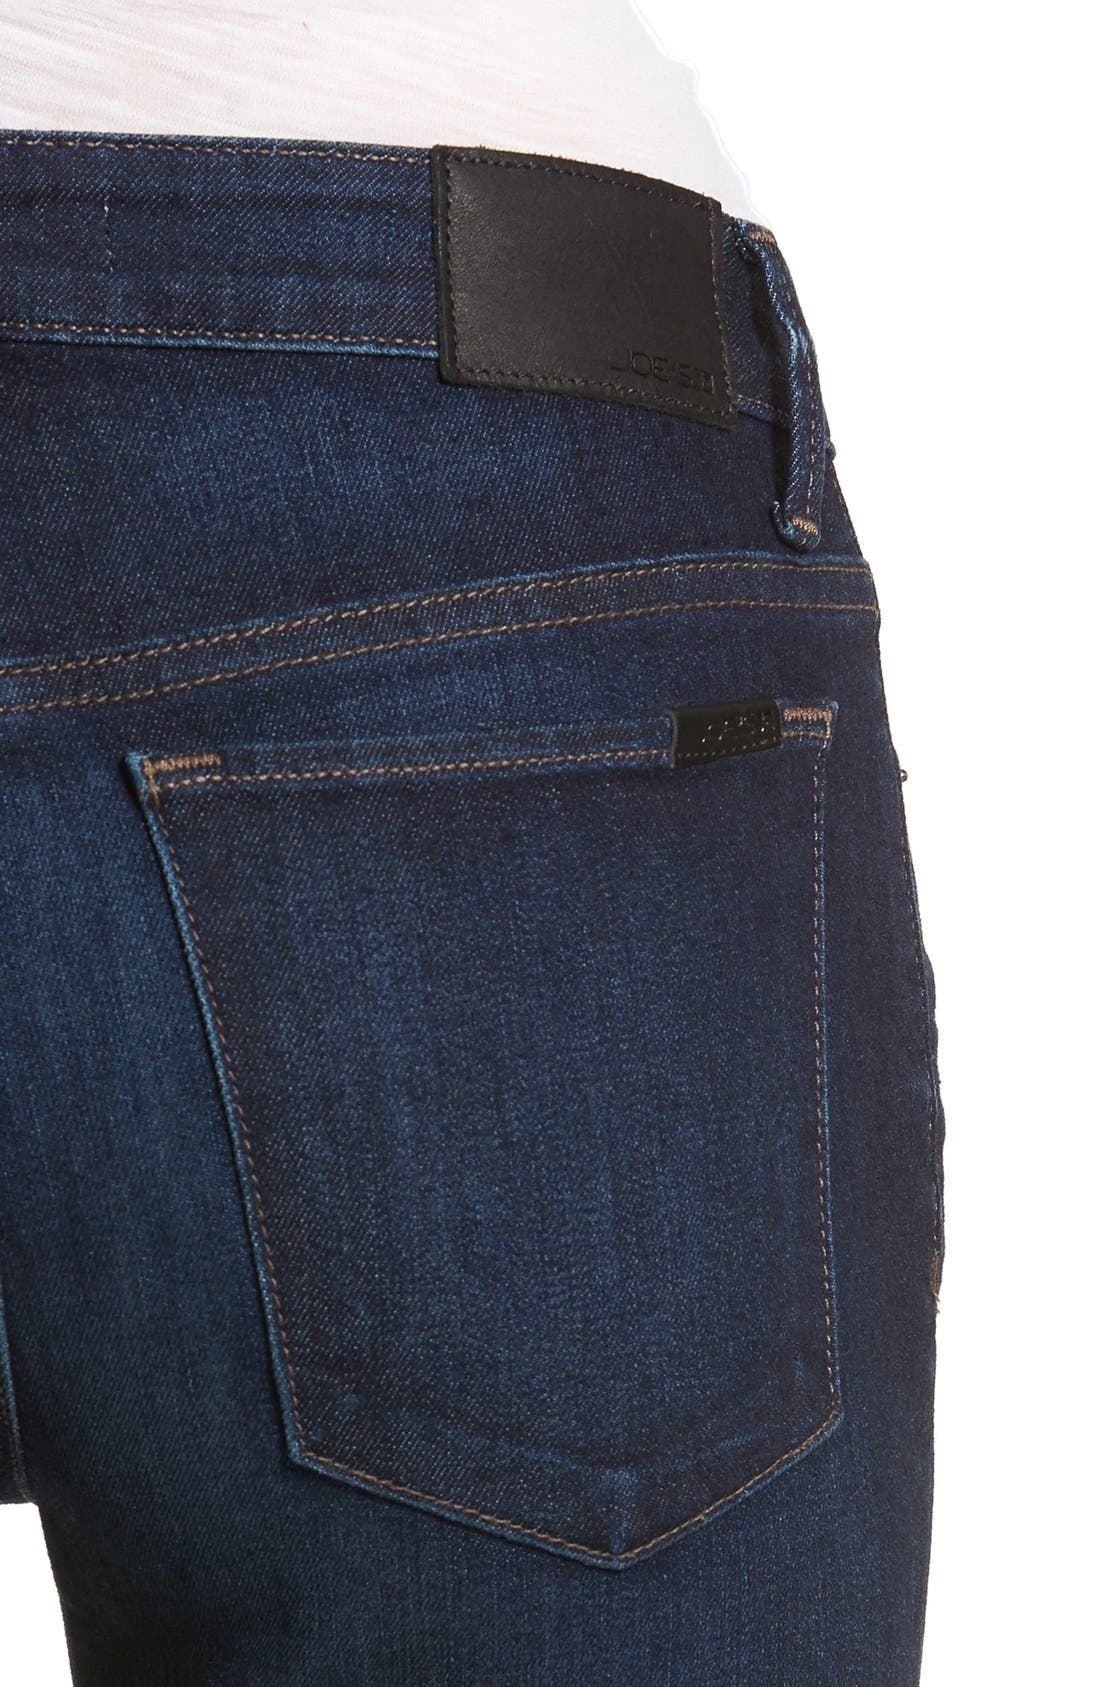 Alternate Image 4  - Joe's Honey Curvy Bootcut Jeans (Loreyn)